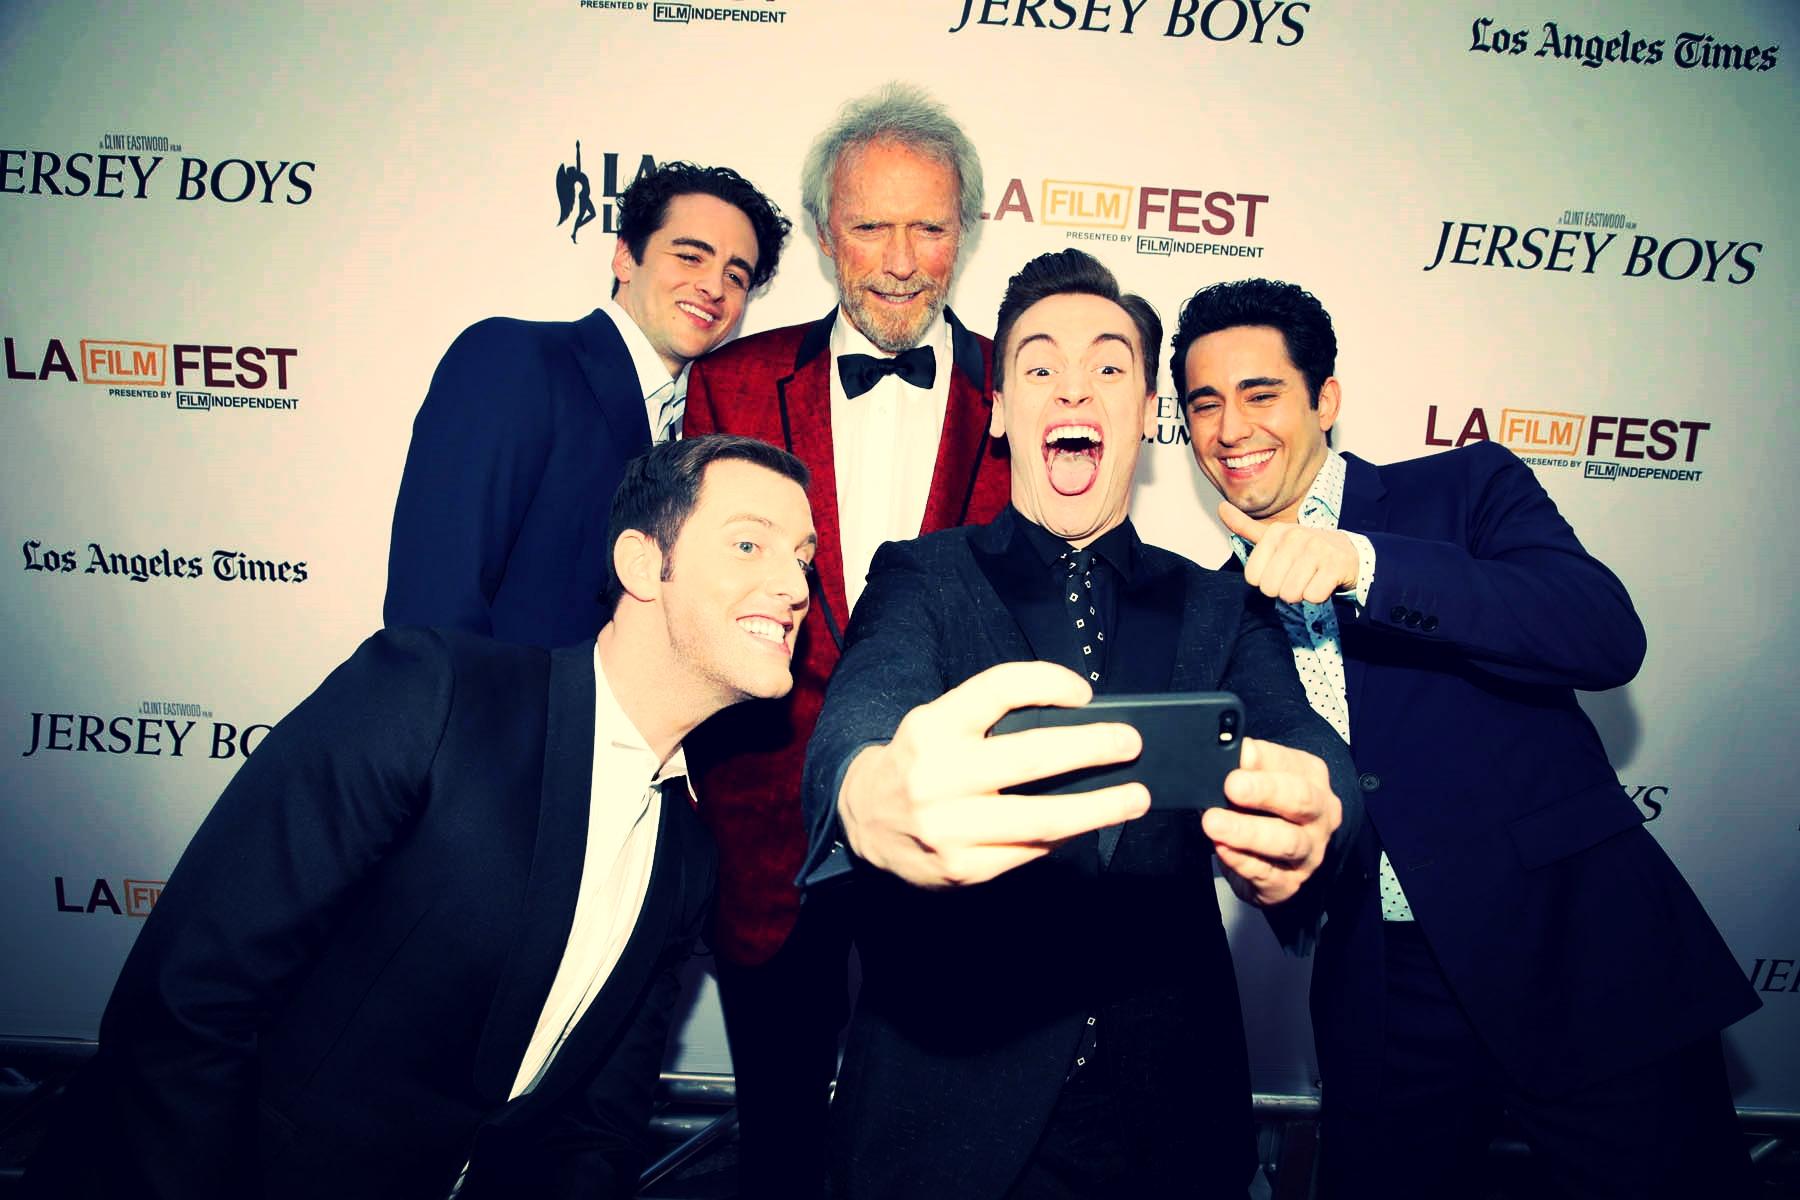 LA Film Festival selfie on the red carpet at the  Jersey Boys premiere